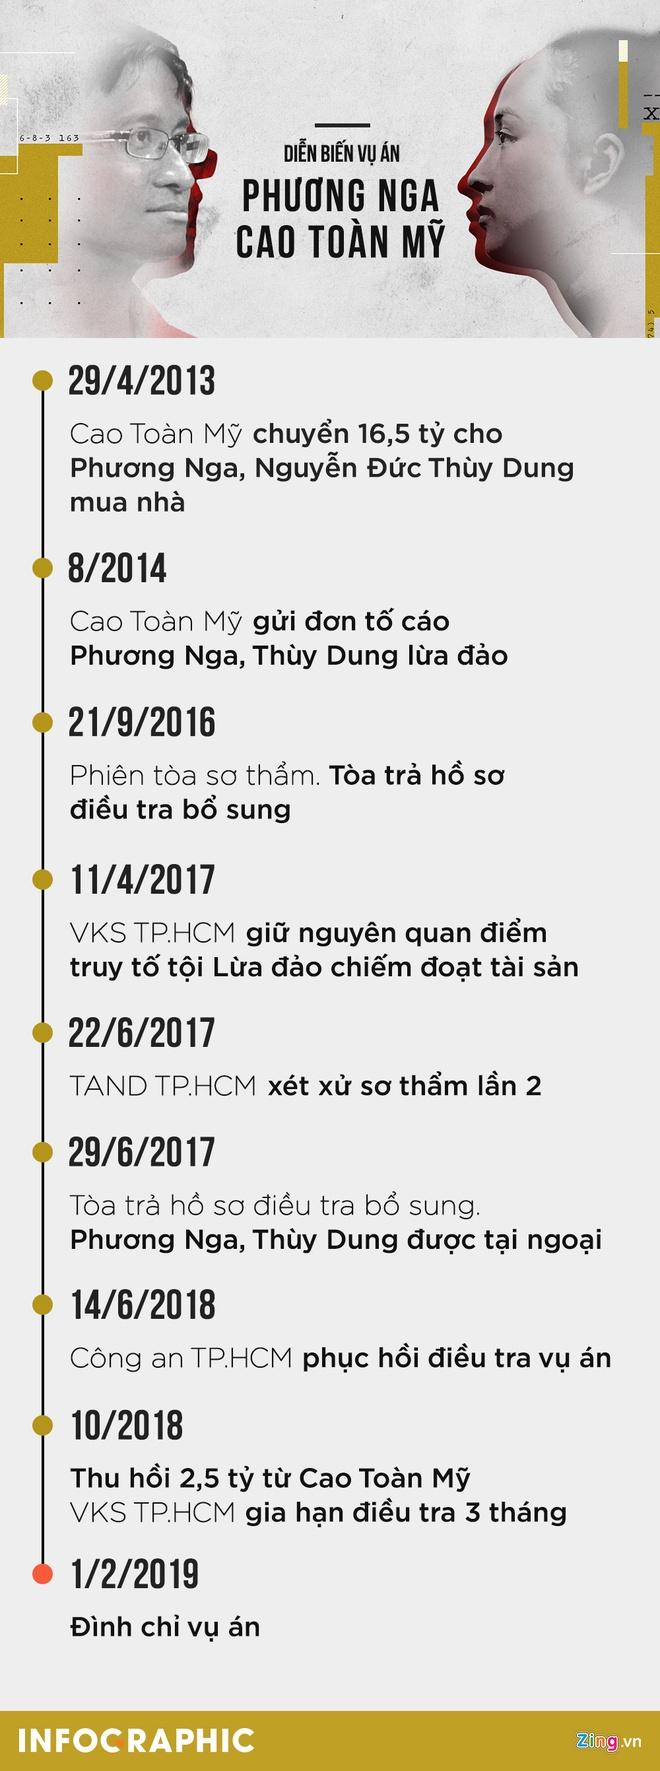 Hoa hau Phuong Nga: 'Tet nay, toi bat dau nghi ve con duong moi' hinh anh 4